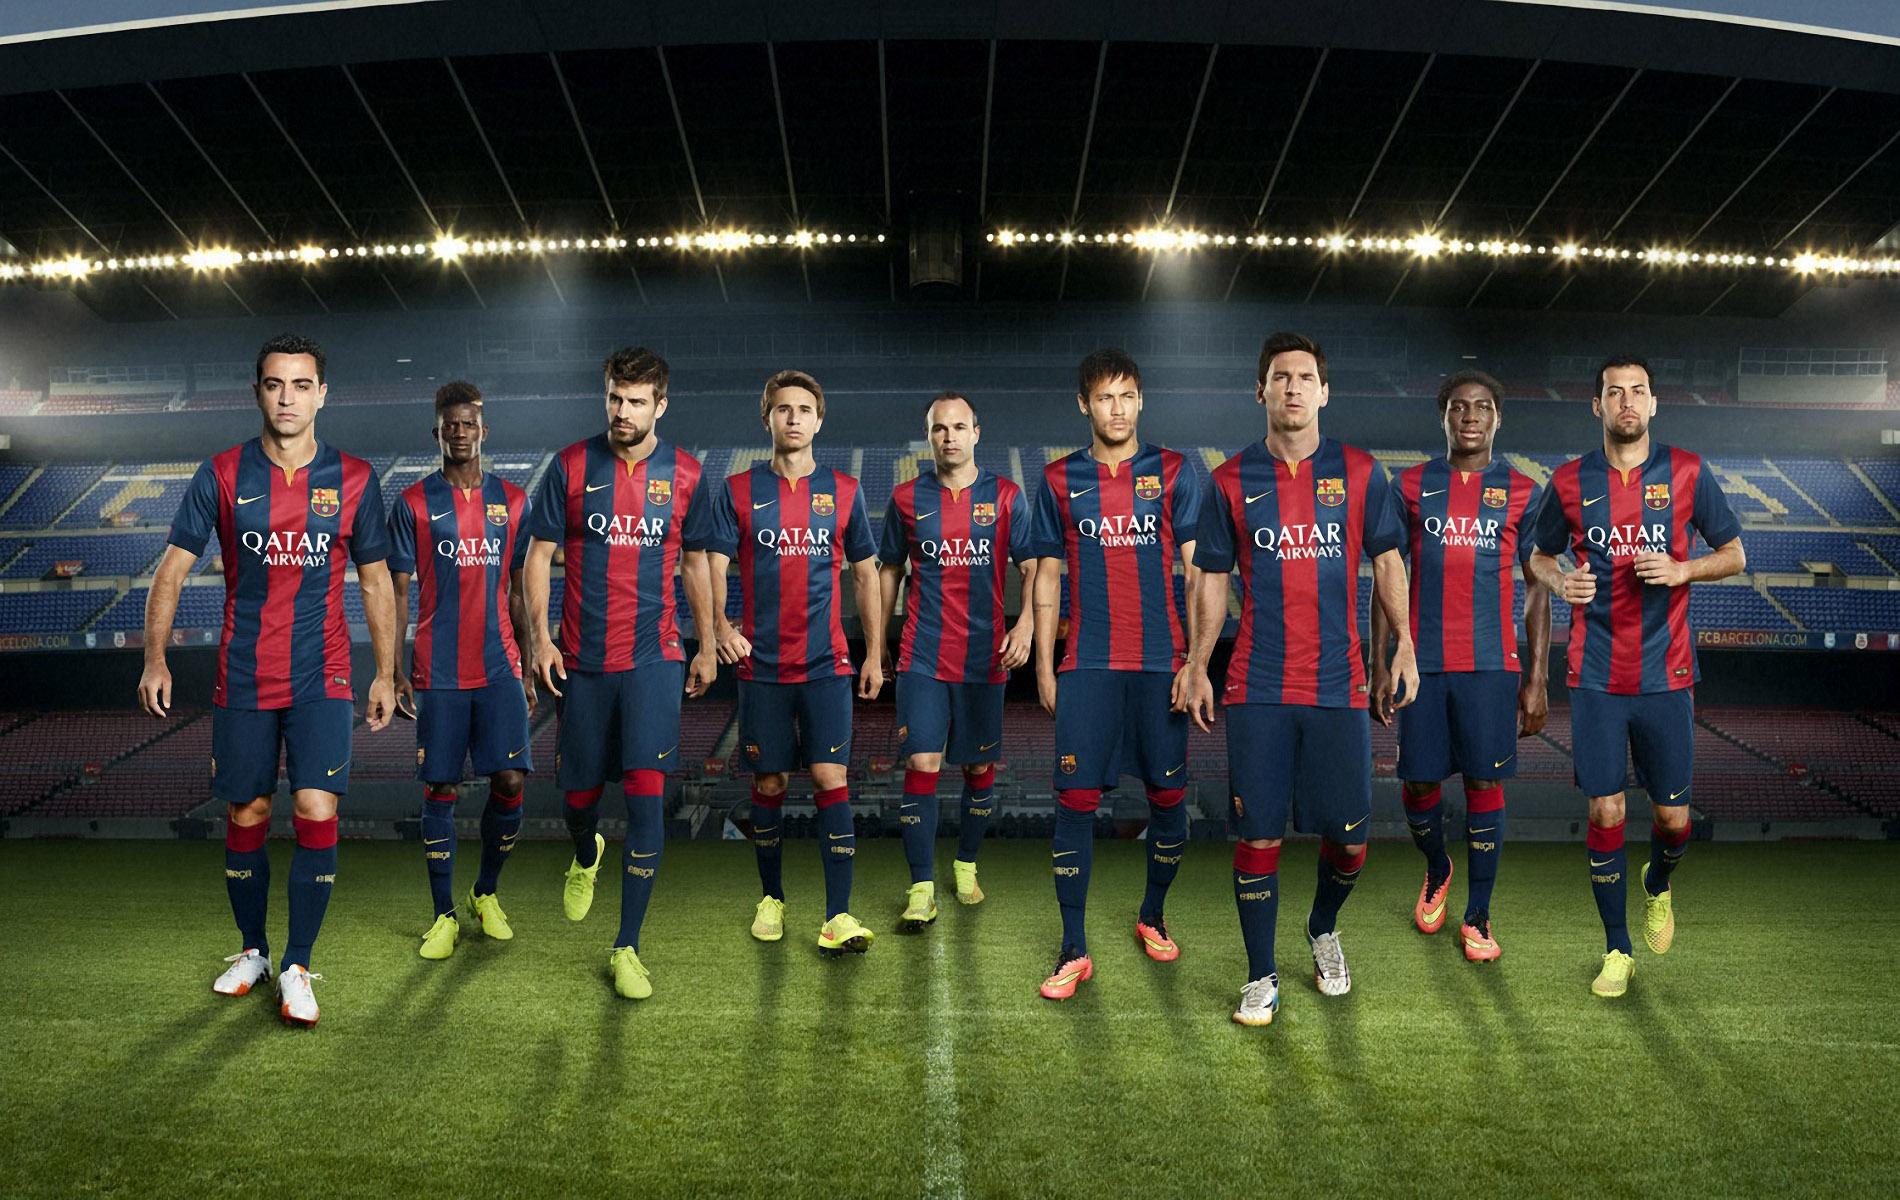 FC Barcelona Team Wallpaper 2015 The Art Mad Wallpapers 1900x1200